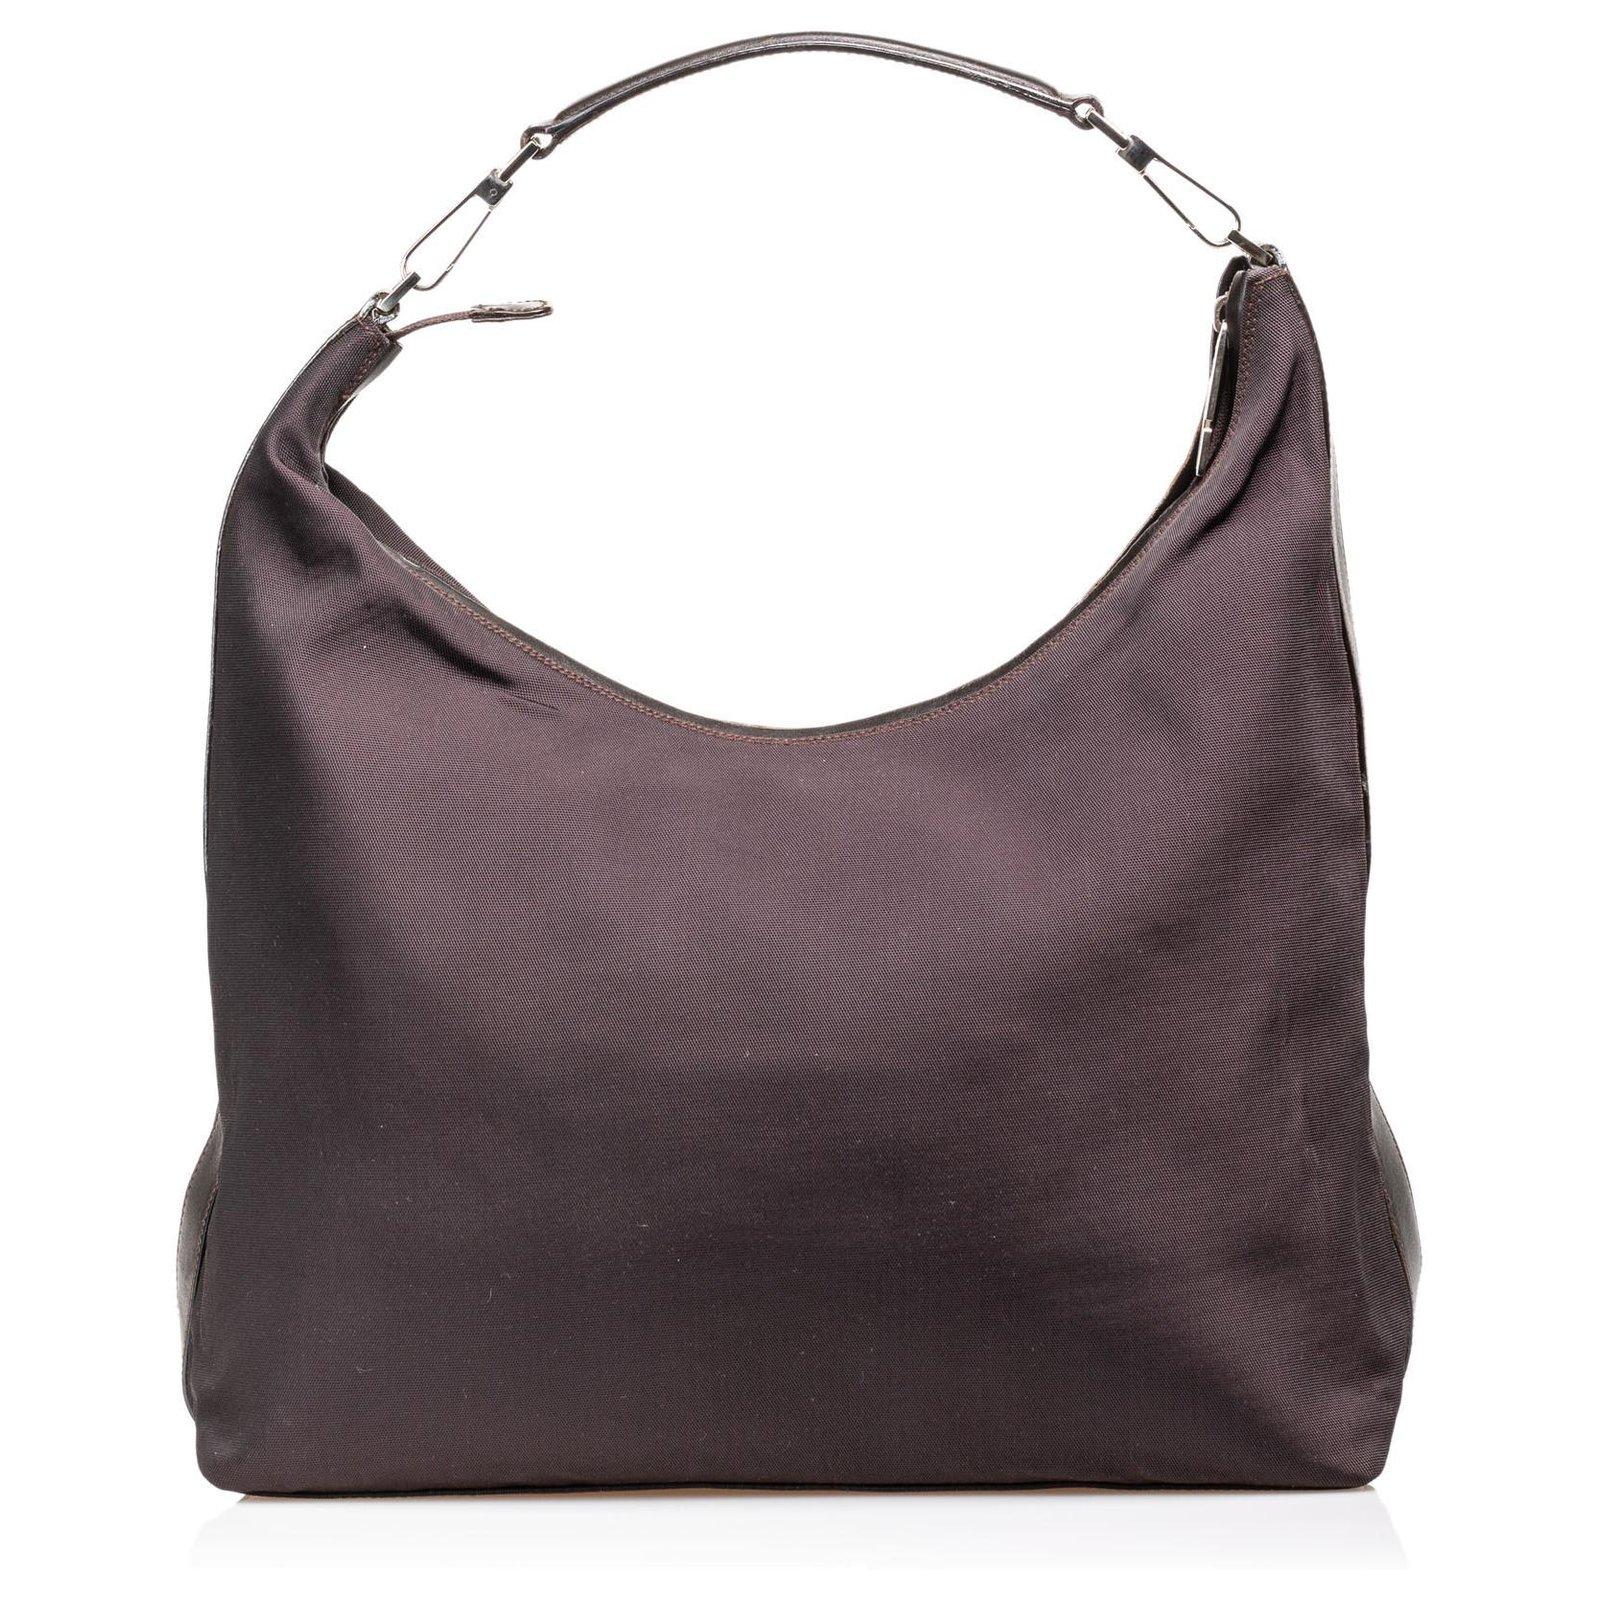 8bb4bb73e1eb Gucci Gucci Black Nylon Shoulder Bag Handbags Leather,Other,Nylon,Cloth  Black ref